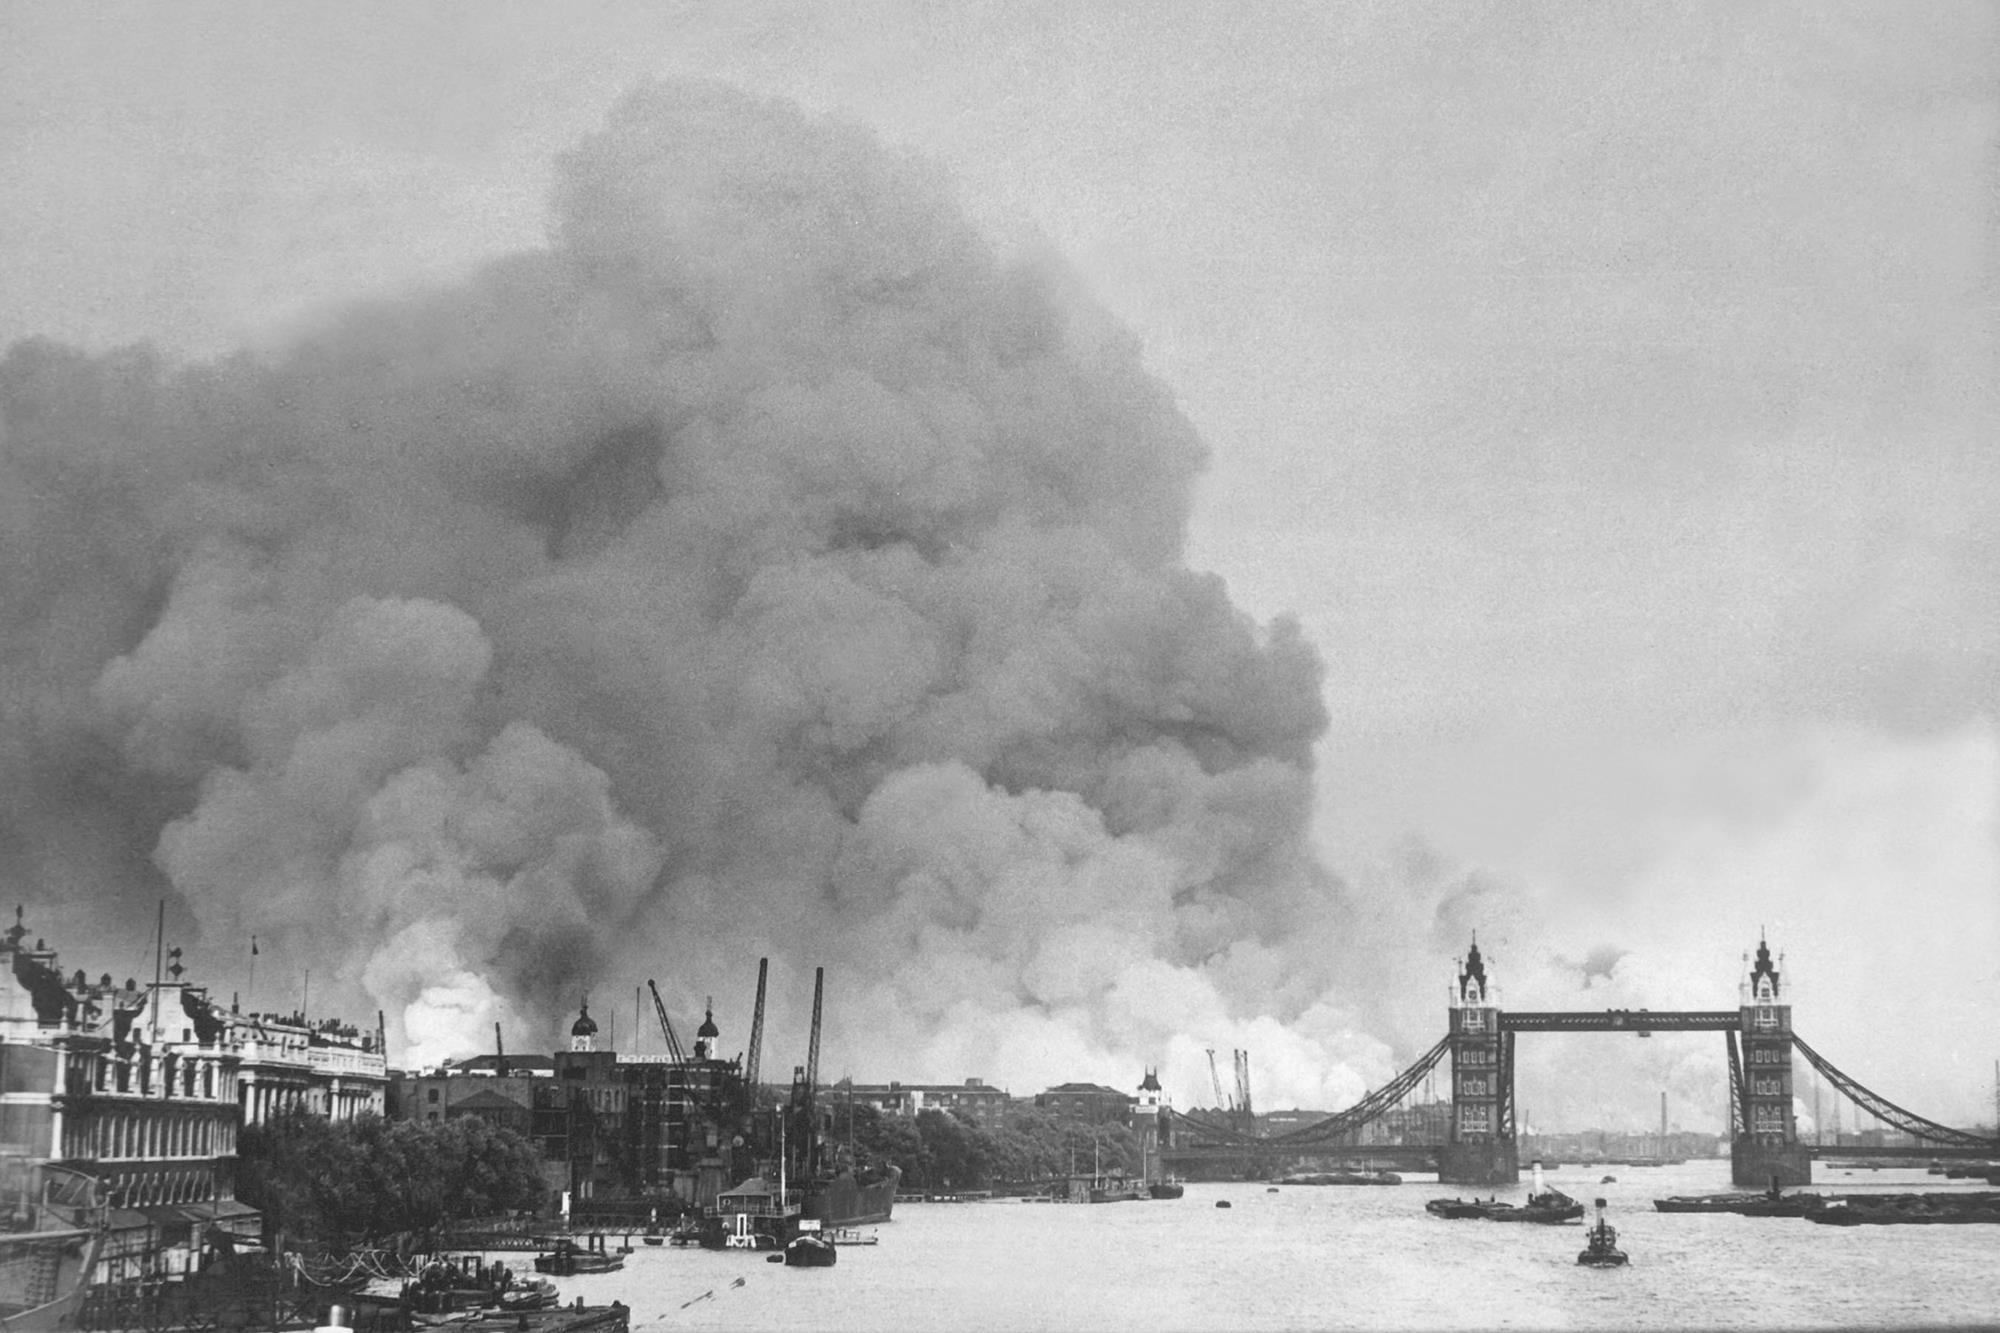 London soil pollution worst on former Blitz bomb sites